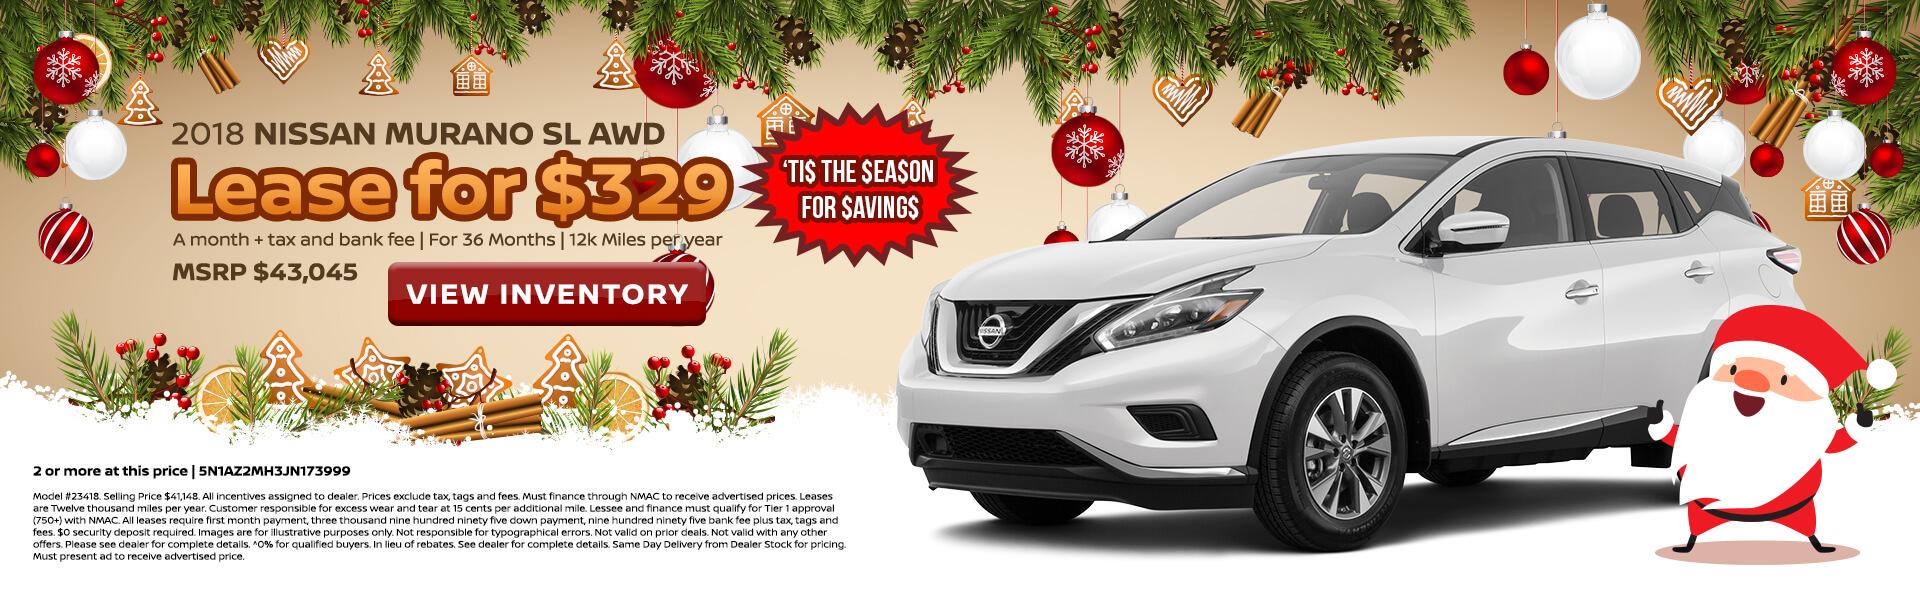 Nissan Murano $329 Lease